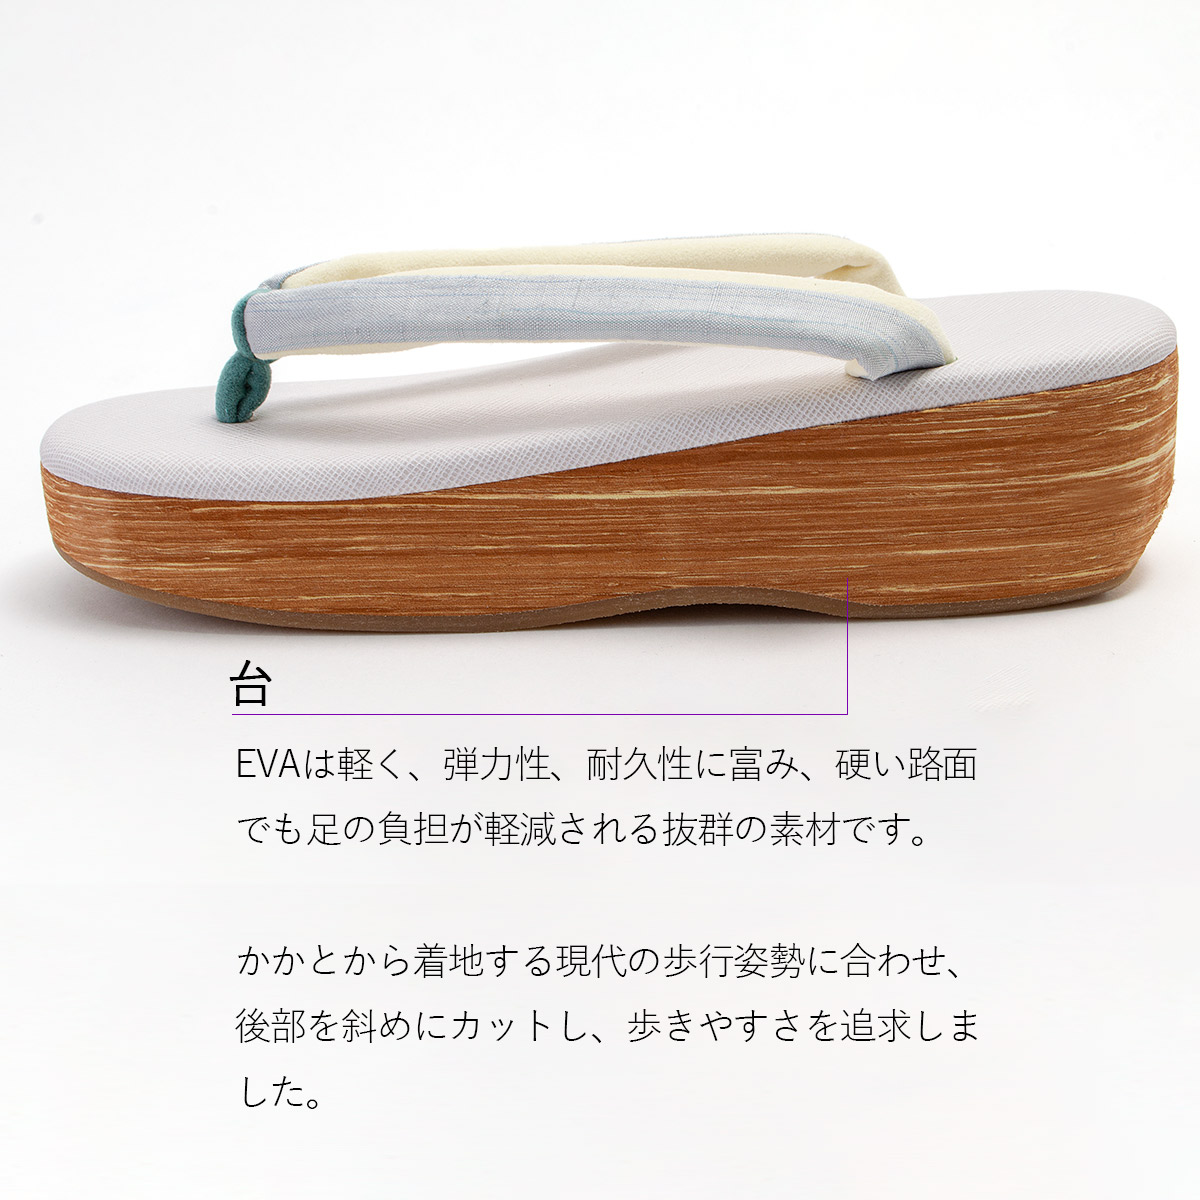 . HAKU 草履 NO.141 |ホワイト×ブルー /> <br><br> <img src=